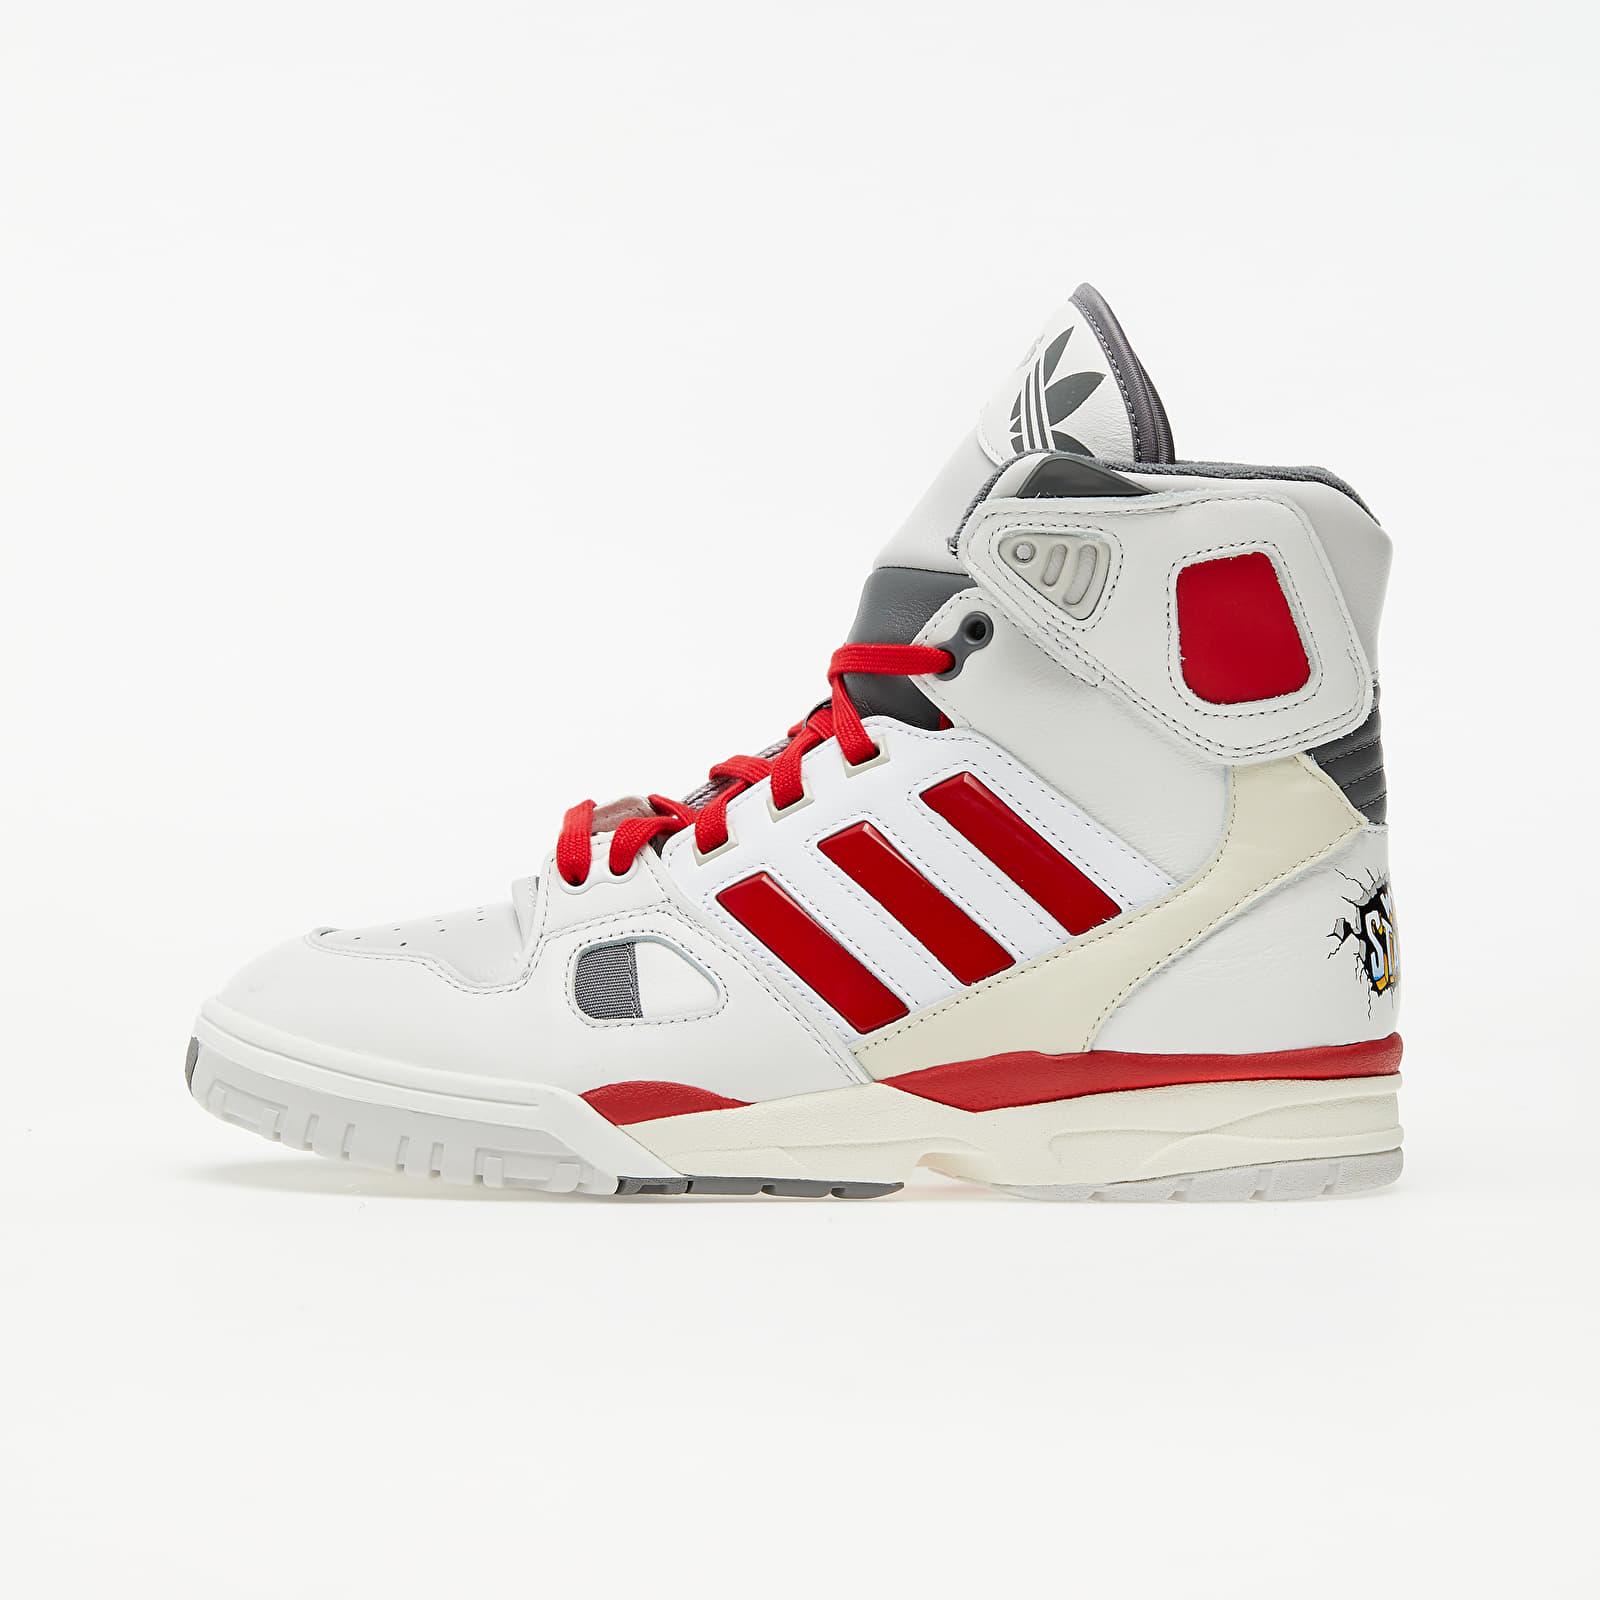 Men's shoes adidas x Kid Cudi Torsion Artiller Crystal White/ Scarlet/ Off White